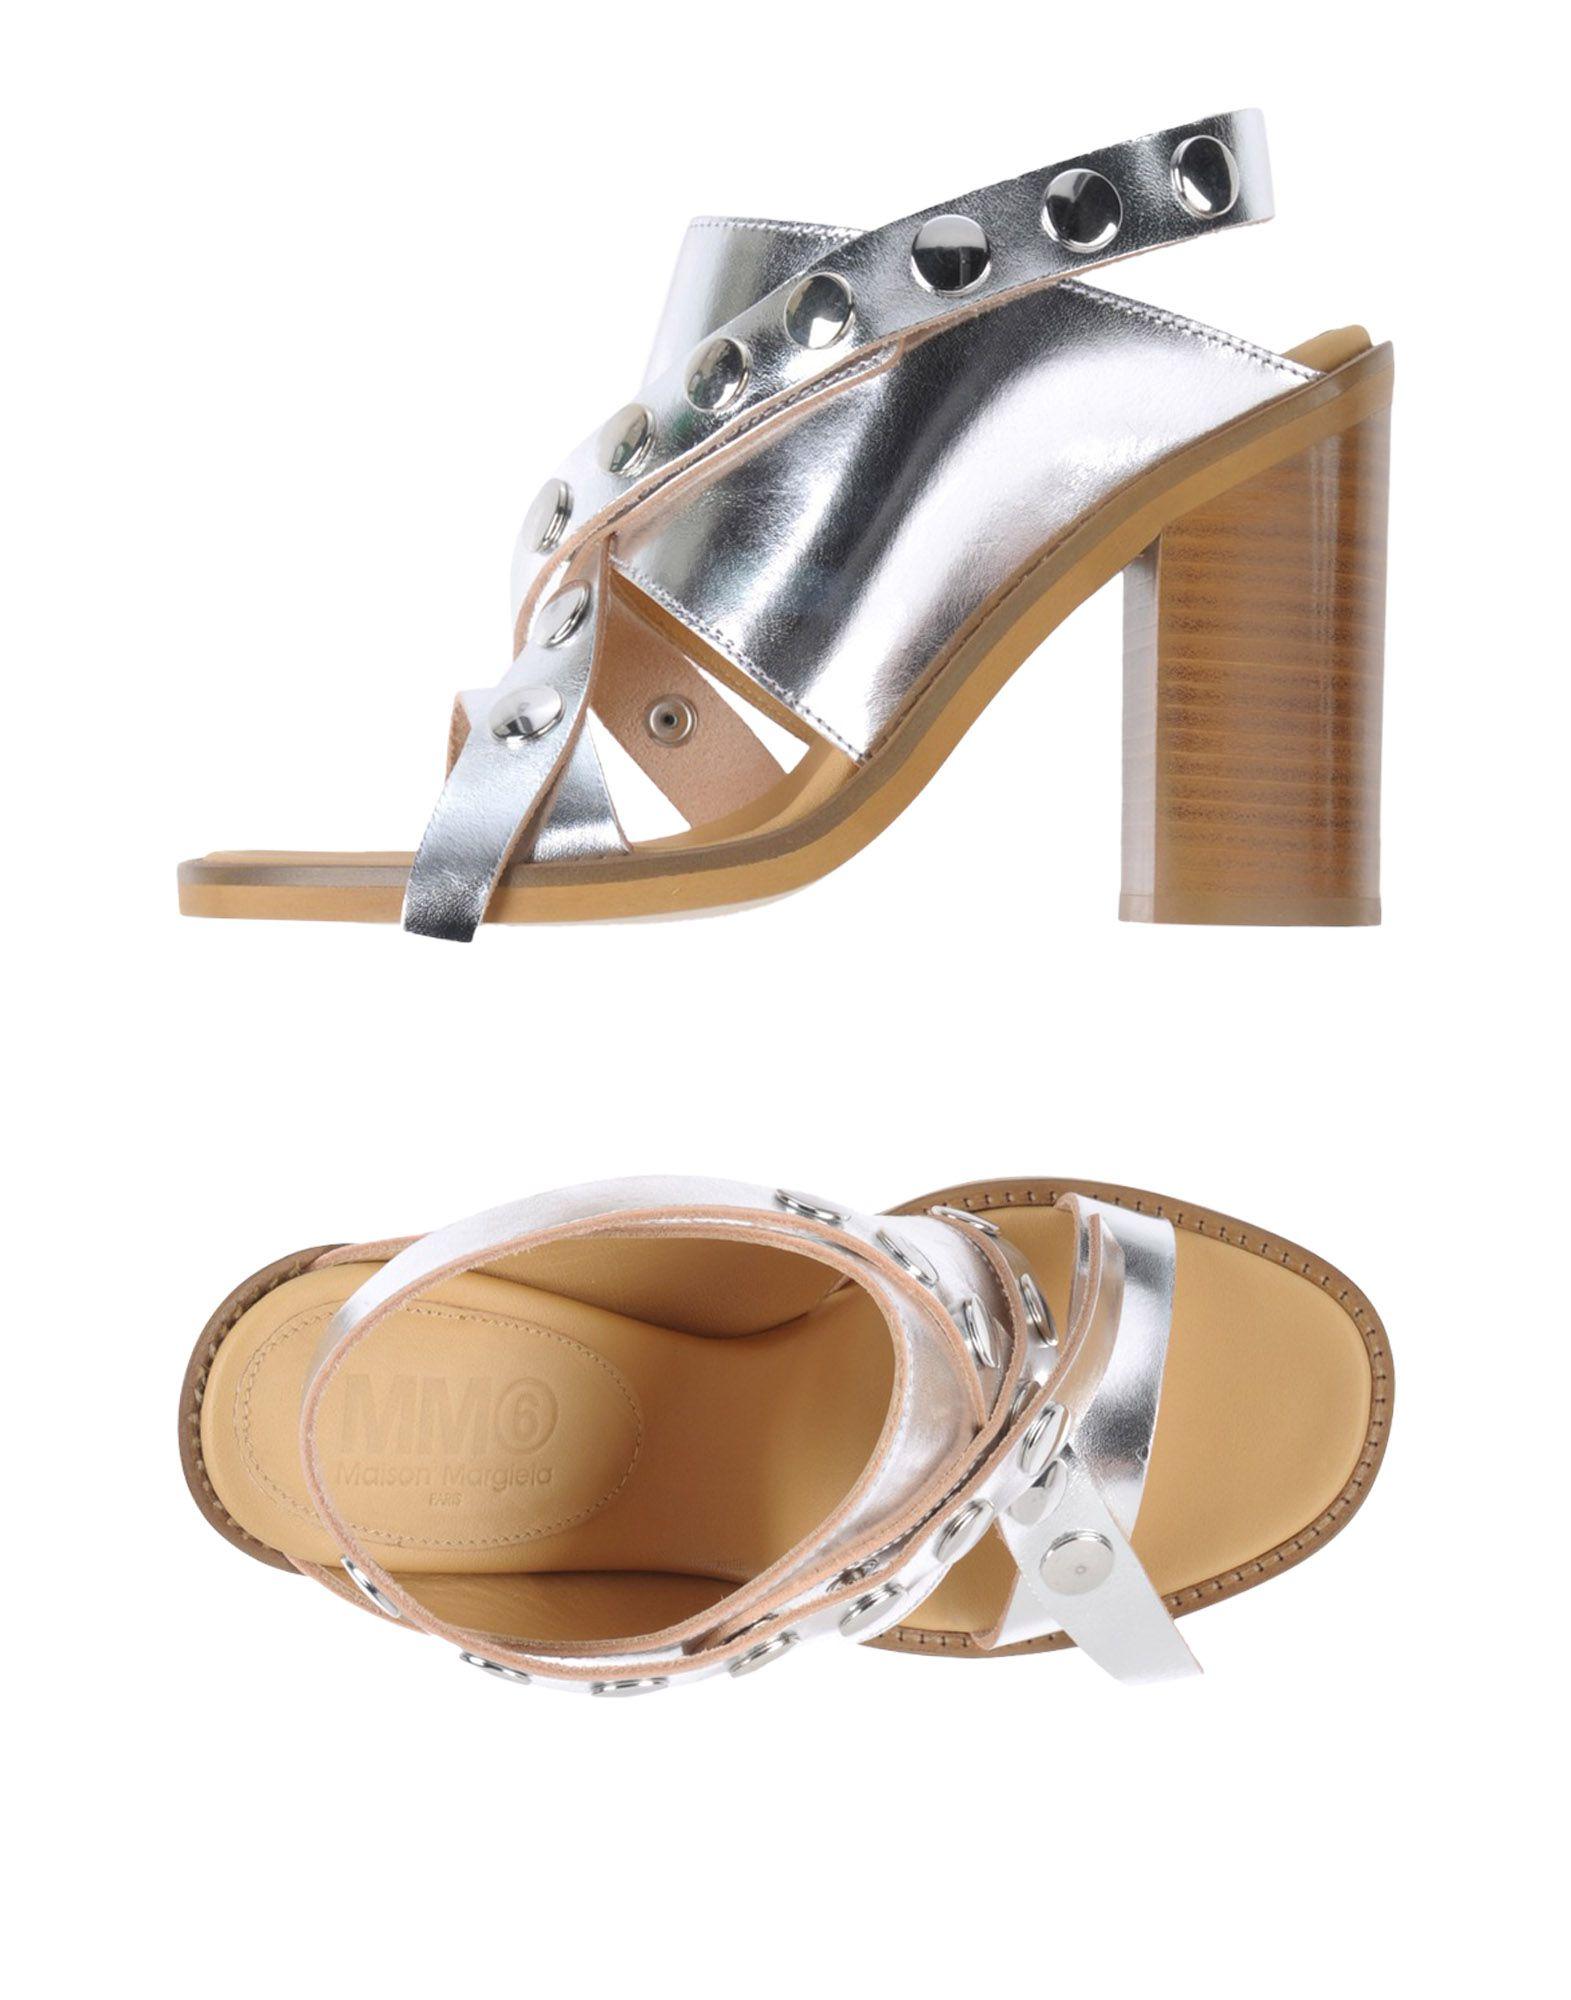 Mm6 Maison Margiela Sandalen Schuhe Damen  11402977SR Neue Schuhe Sandalen 19ccff